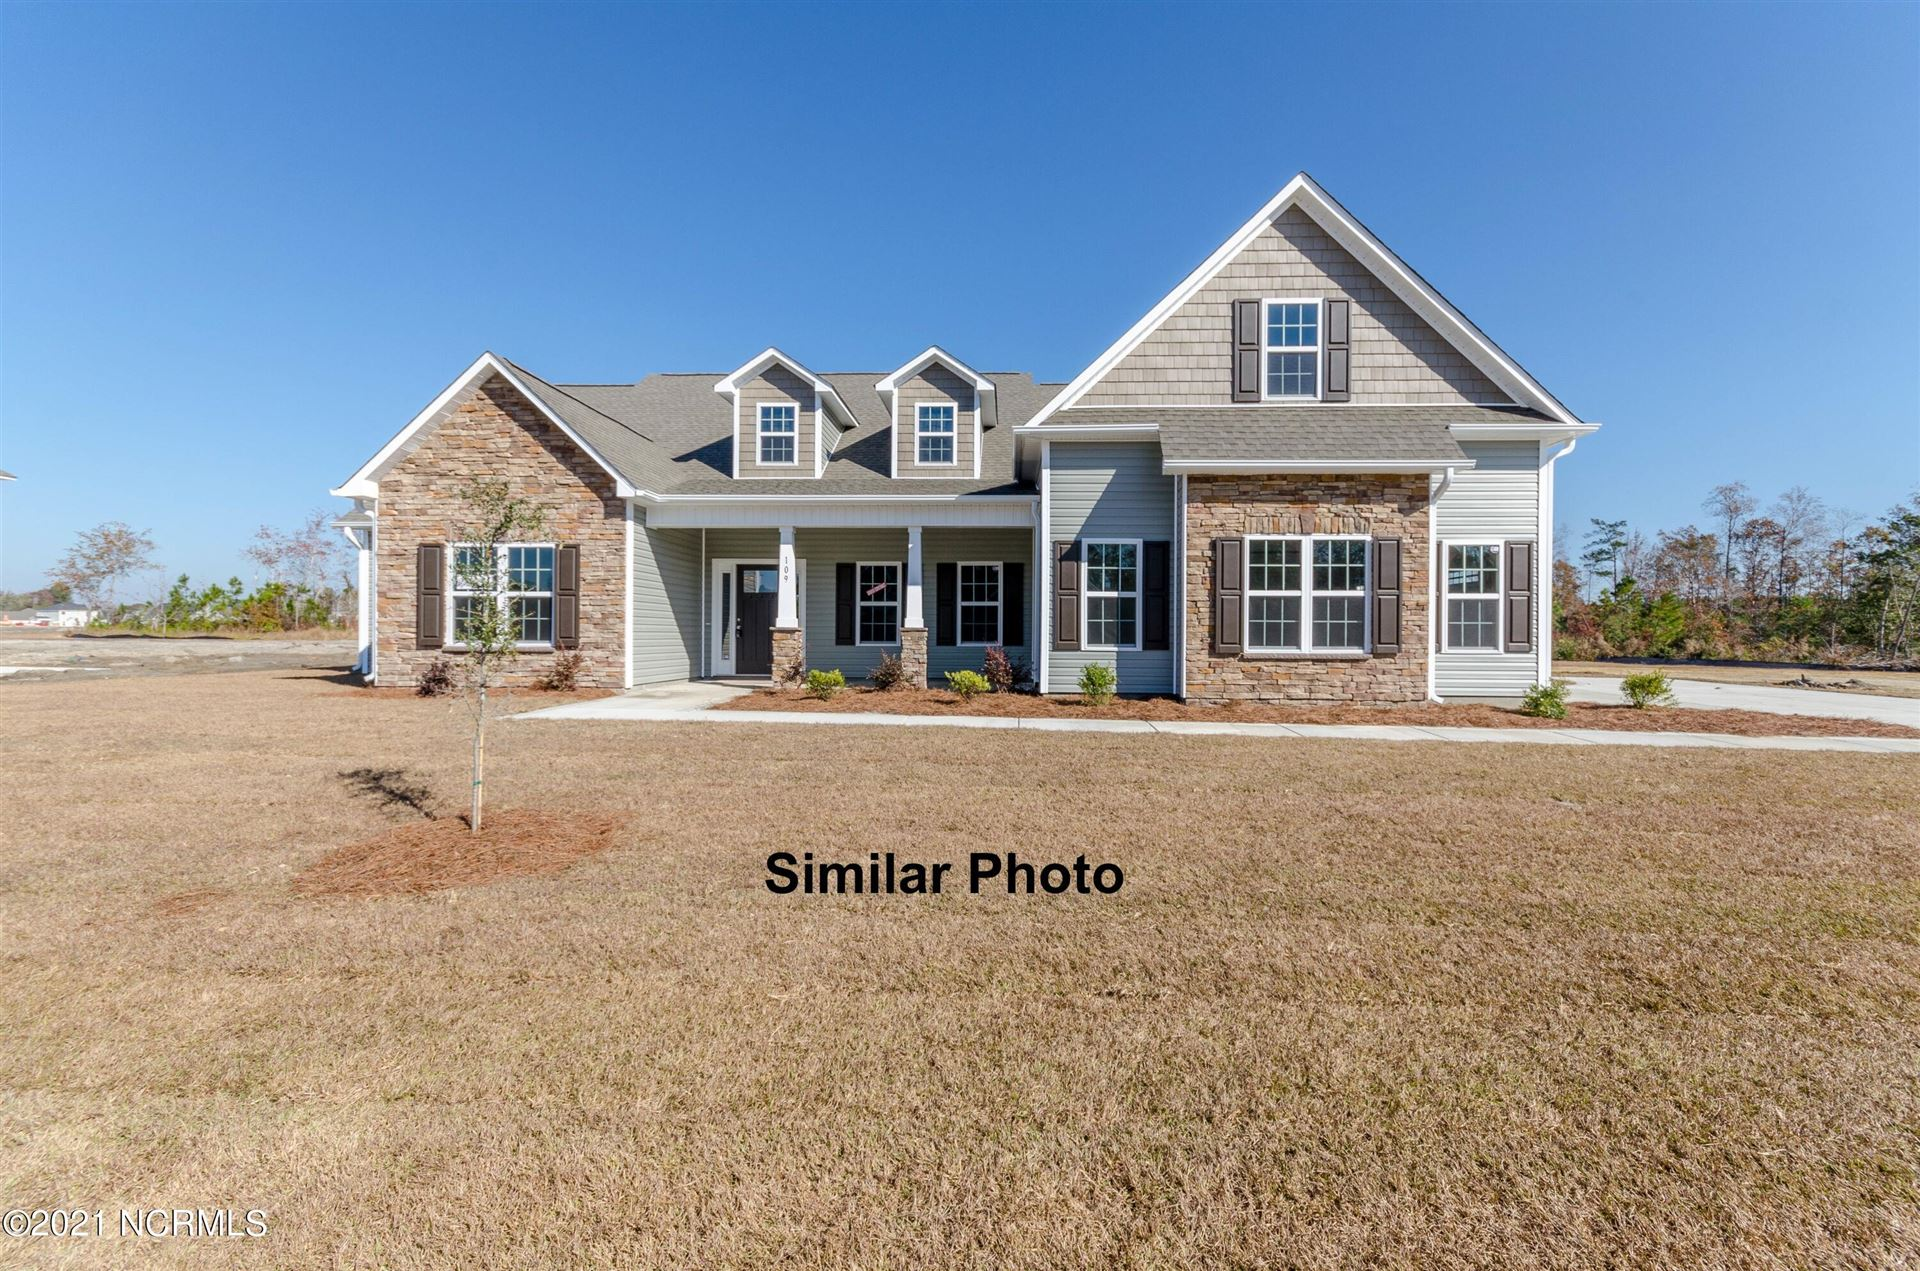 Photo of 516 Jarrott'S Place, Jacksonville, NC 28546 (MLS # 100287739)